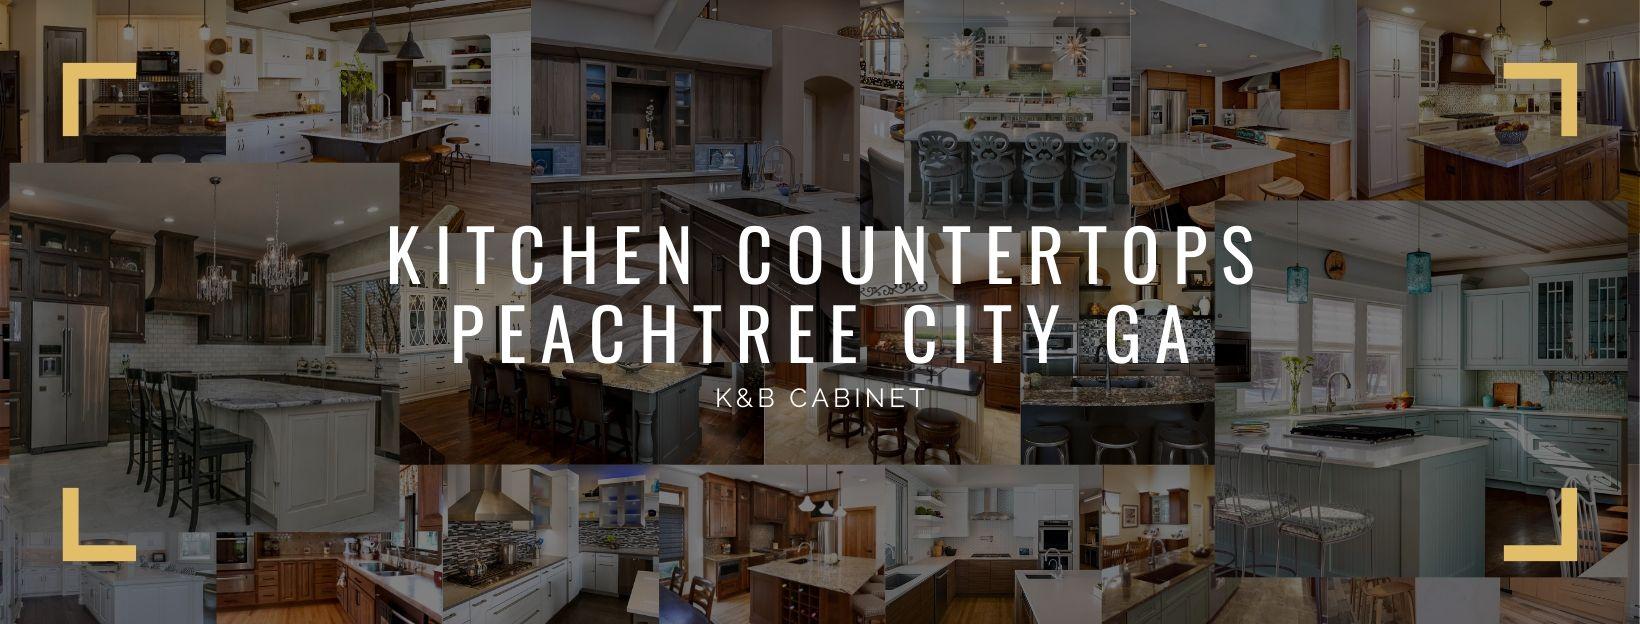 Kitchen Countertops Peachtree City GA